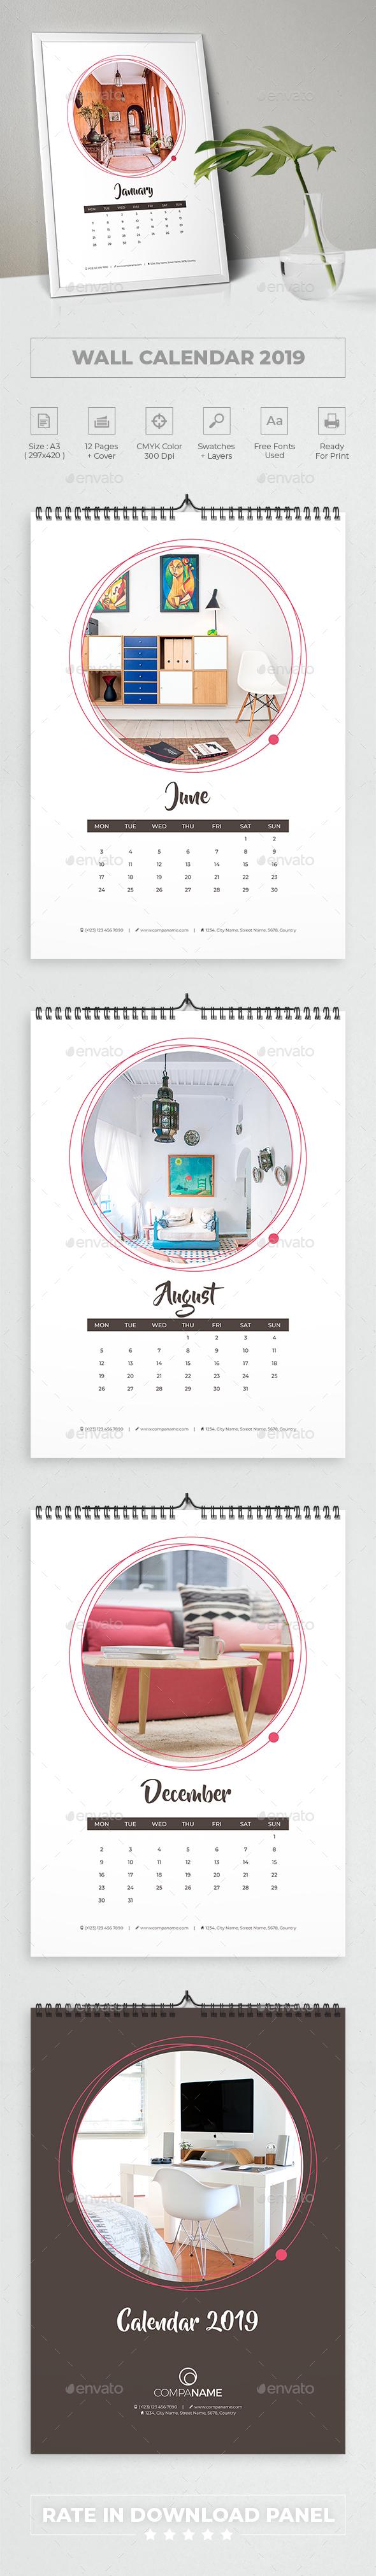 2019 Creative Calendar - Calendars Stationery